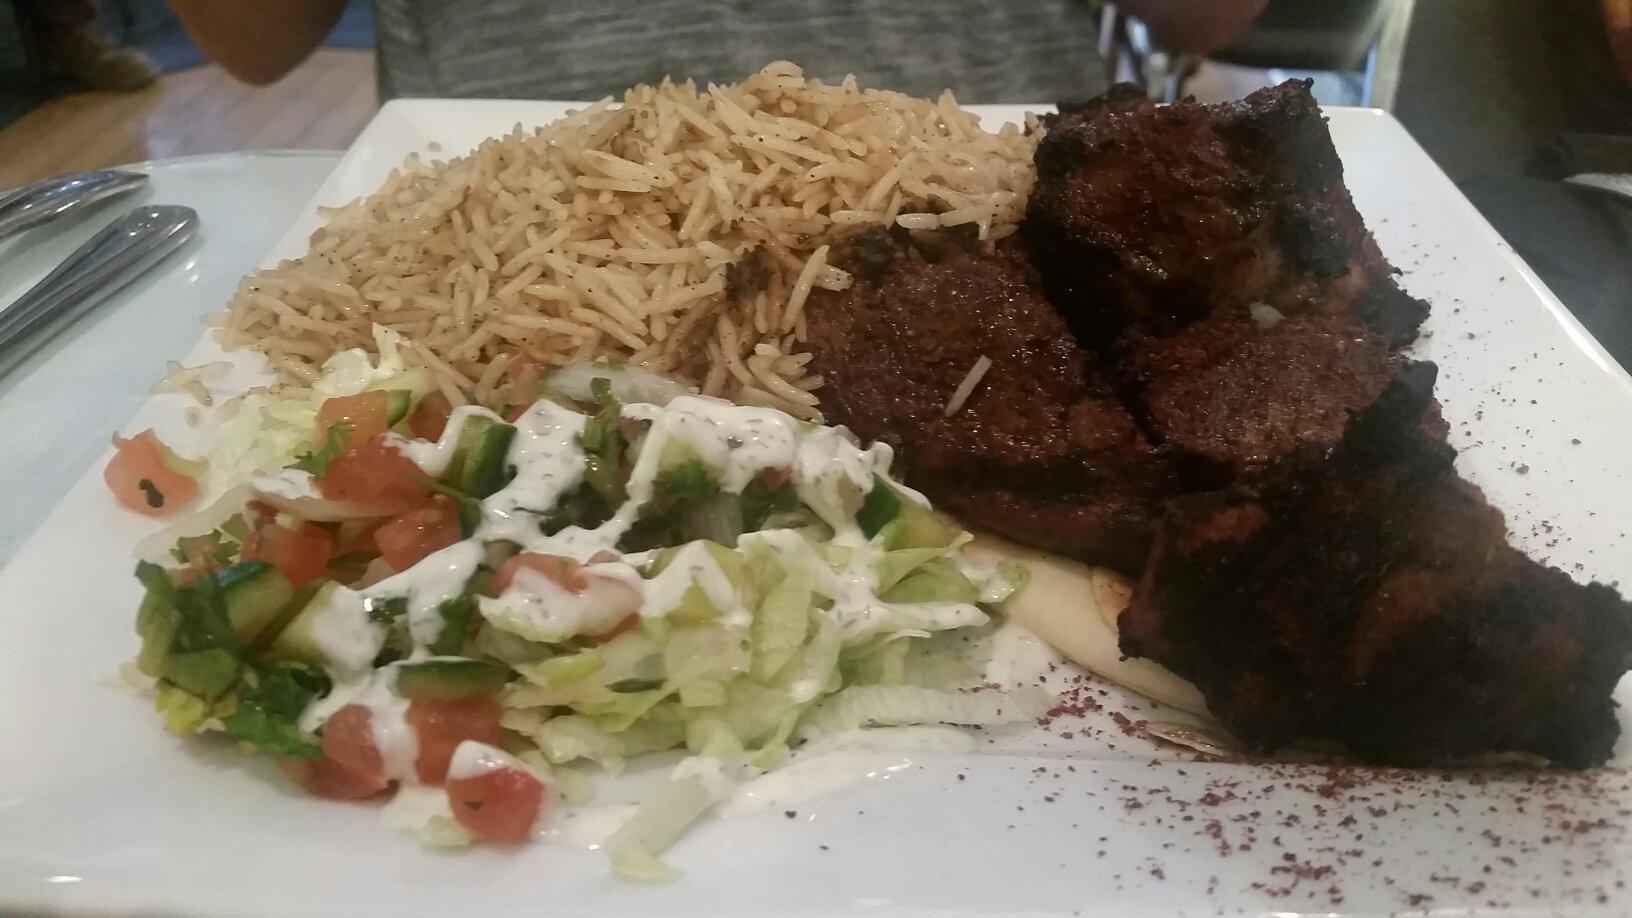 Zara afghan cuisine sacramento restaurant reviews for Afghan cuisine restaurant